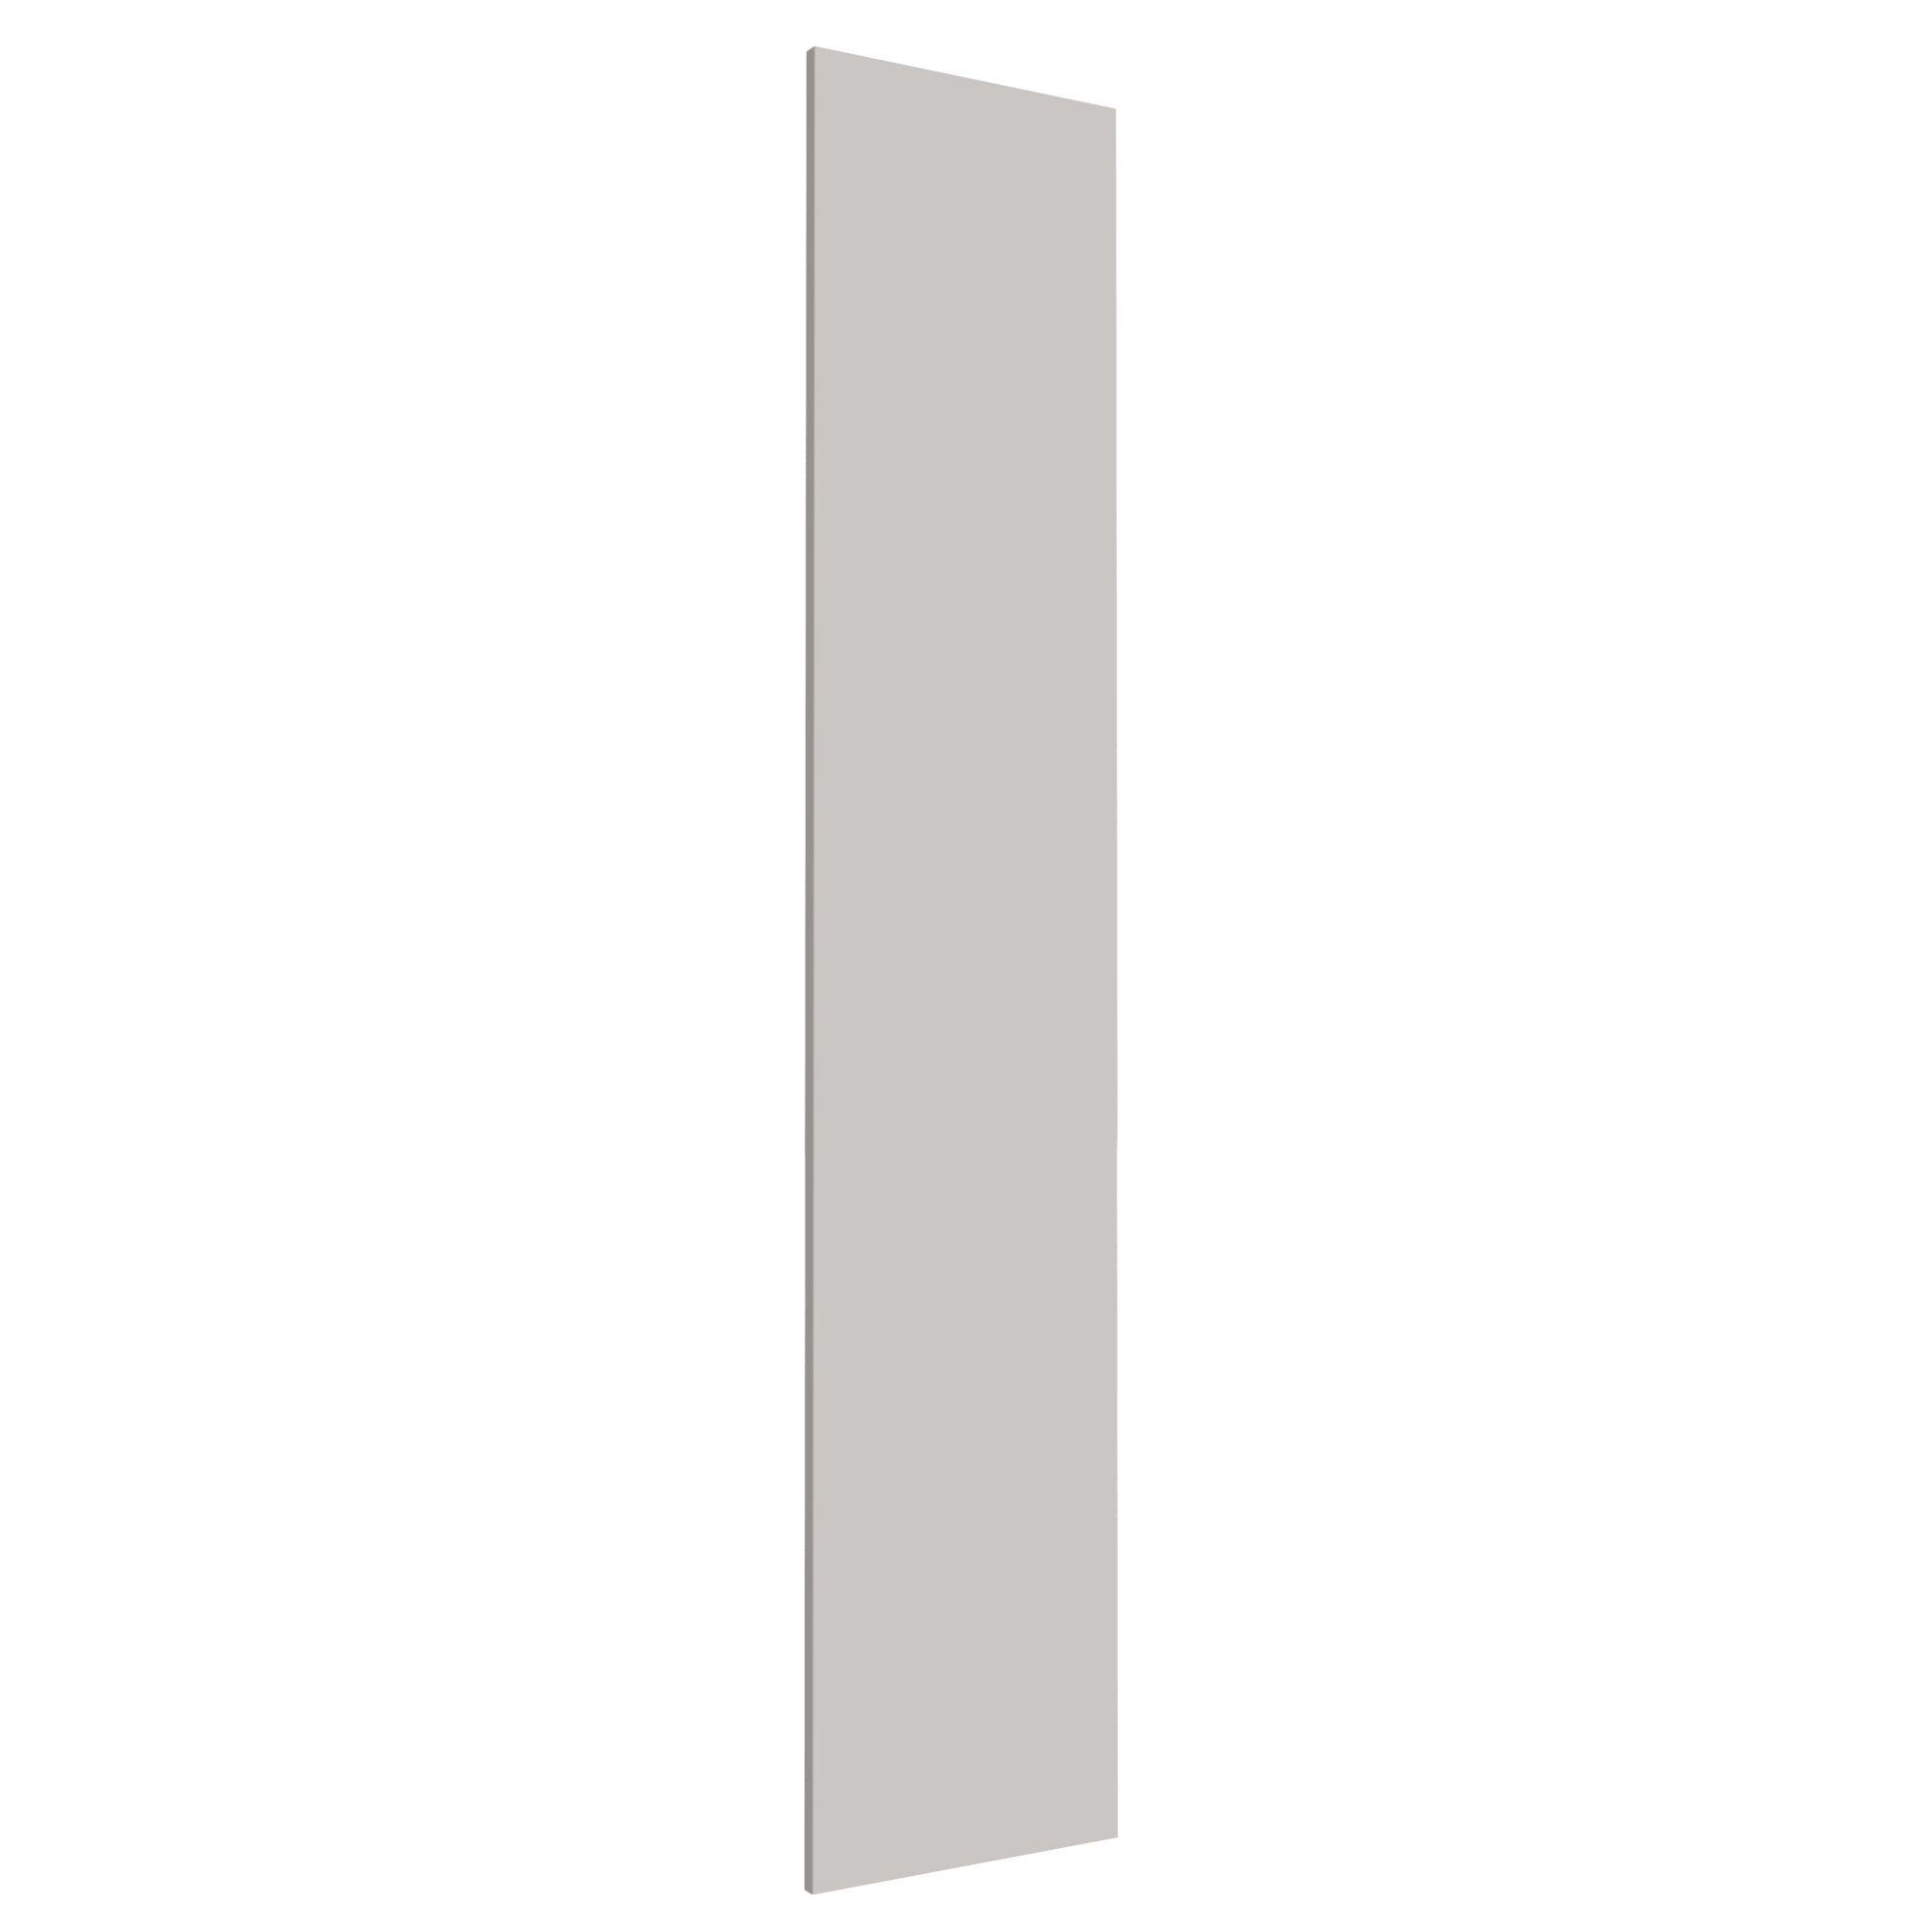 Darwin Modular Grey Wardrobe Door (h)1808mm (w)372mm